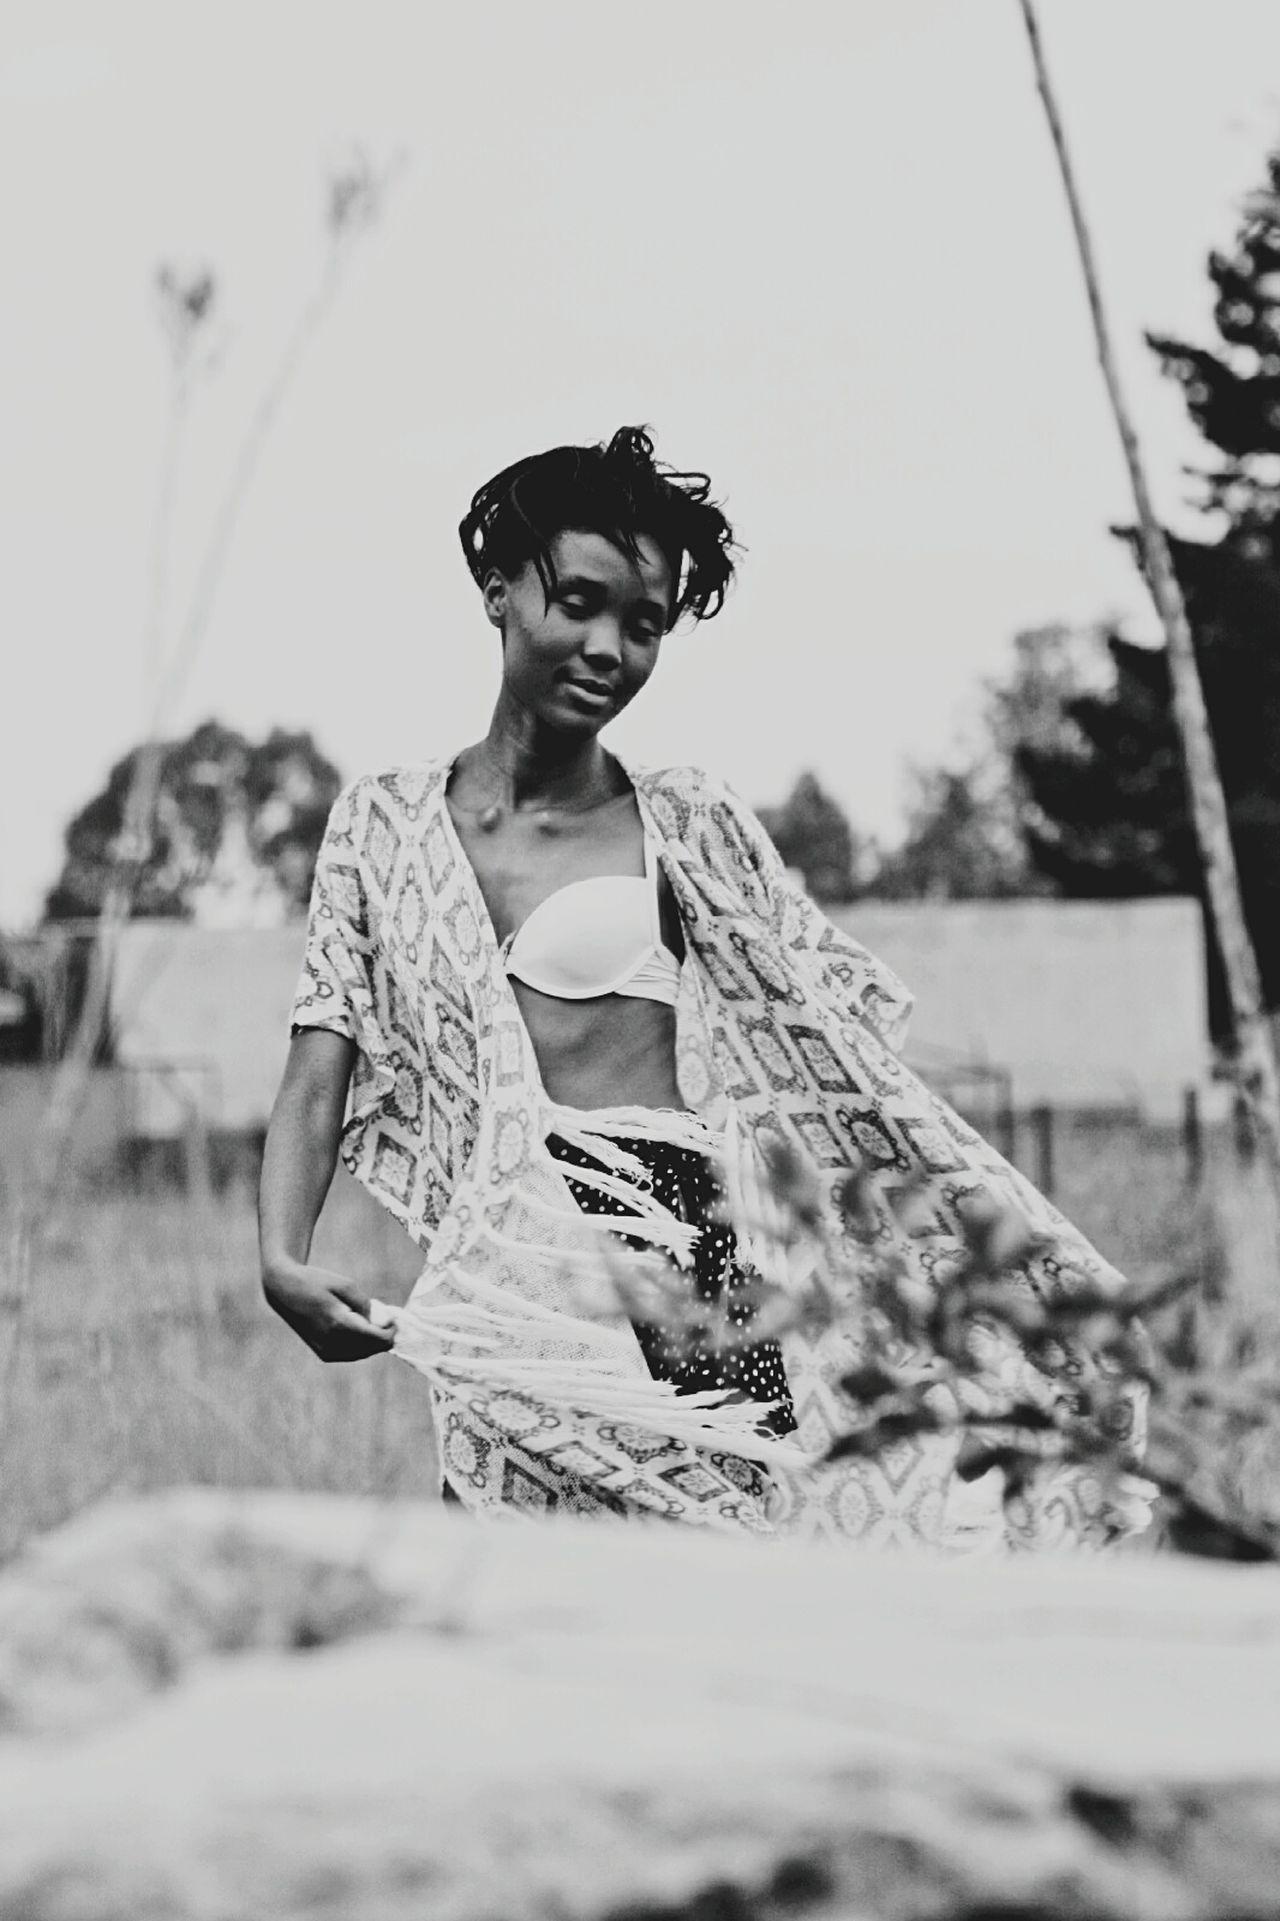 Freespirits Childrenofthesun IAmTheGoldRunner Blackandwhite Photography Inbetweenthetrees